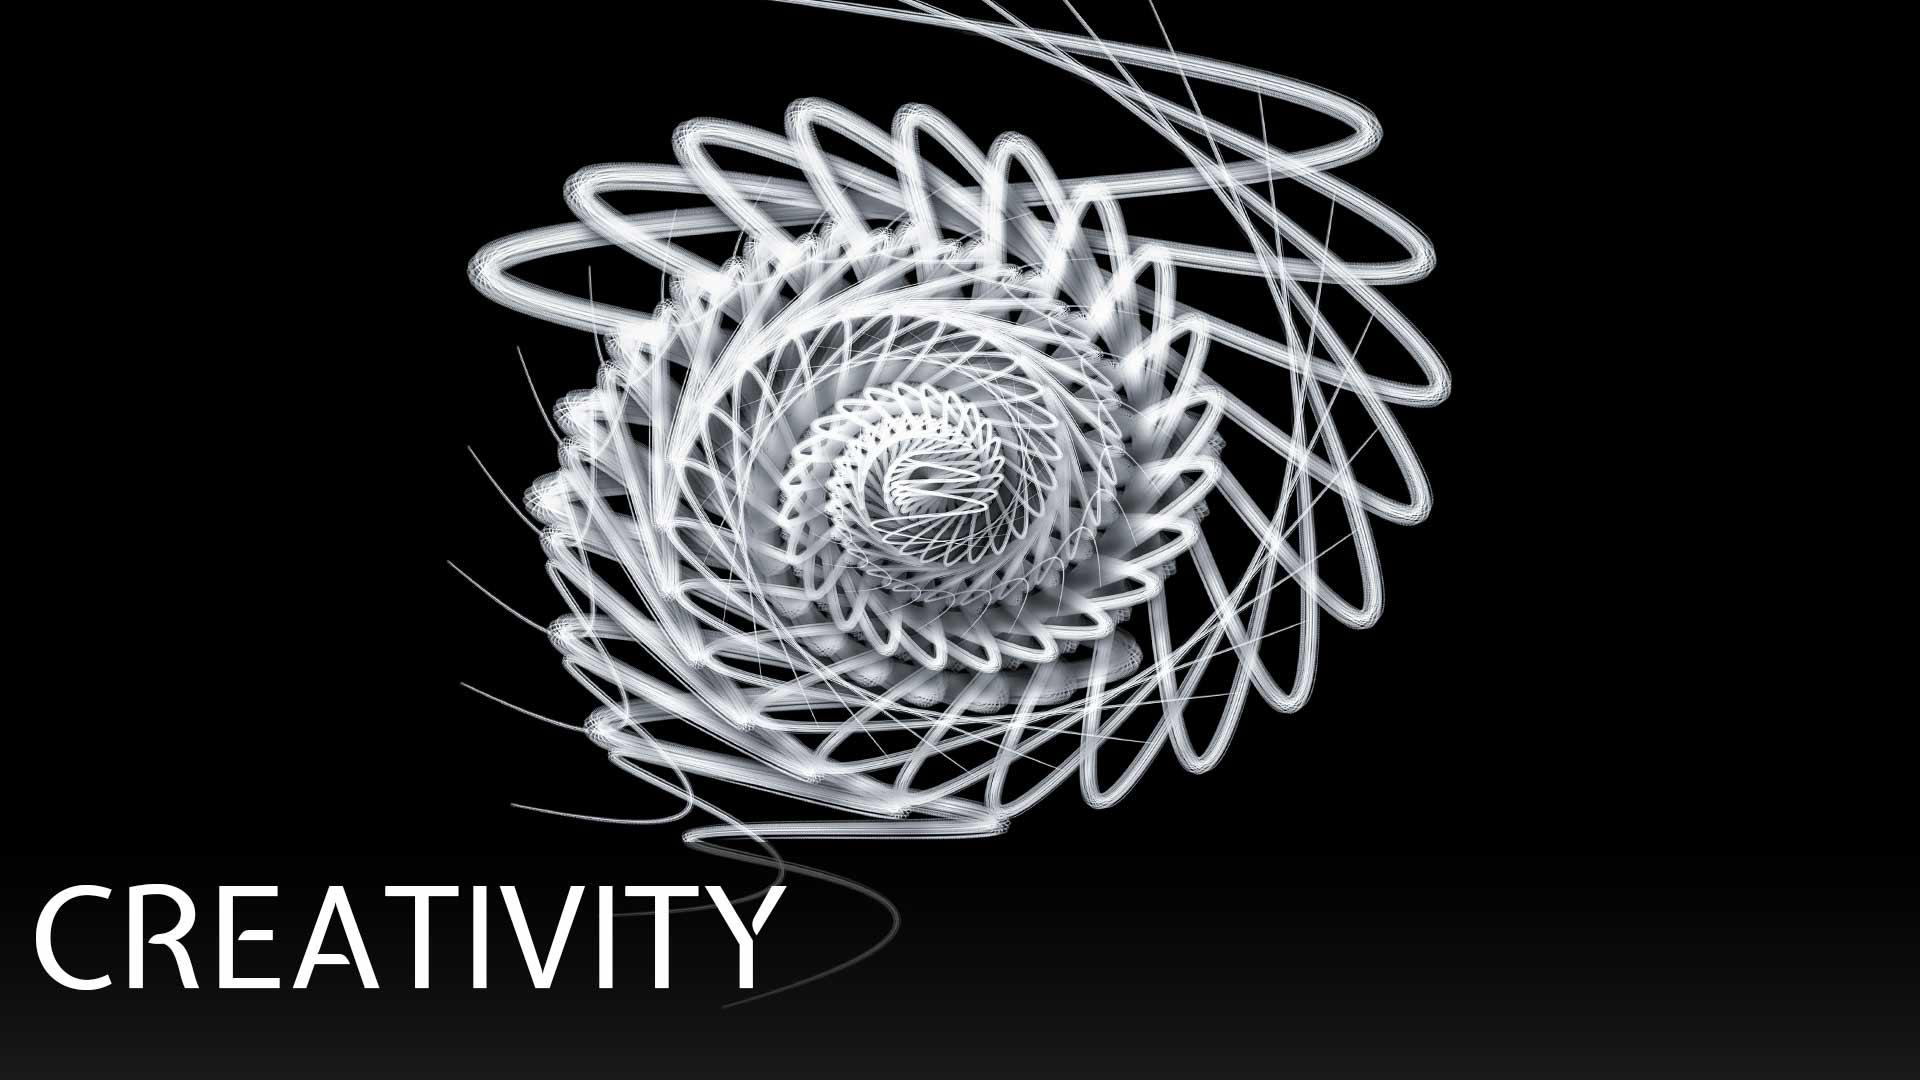 Creative Corporate Design Solutions